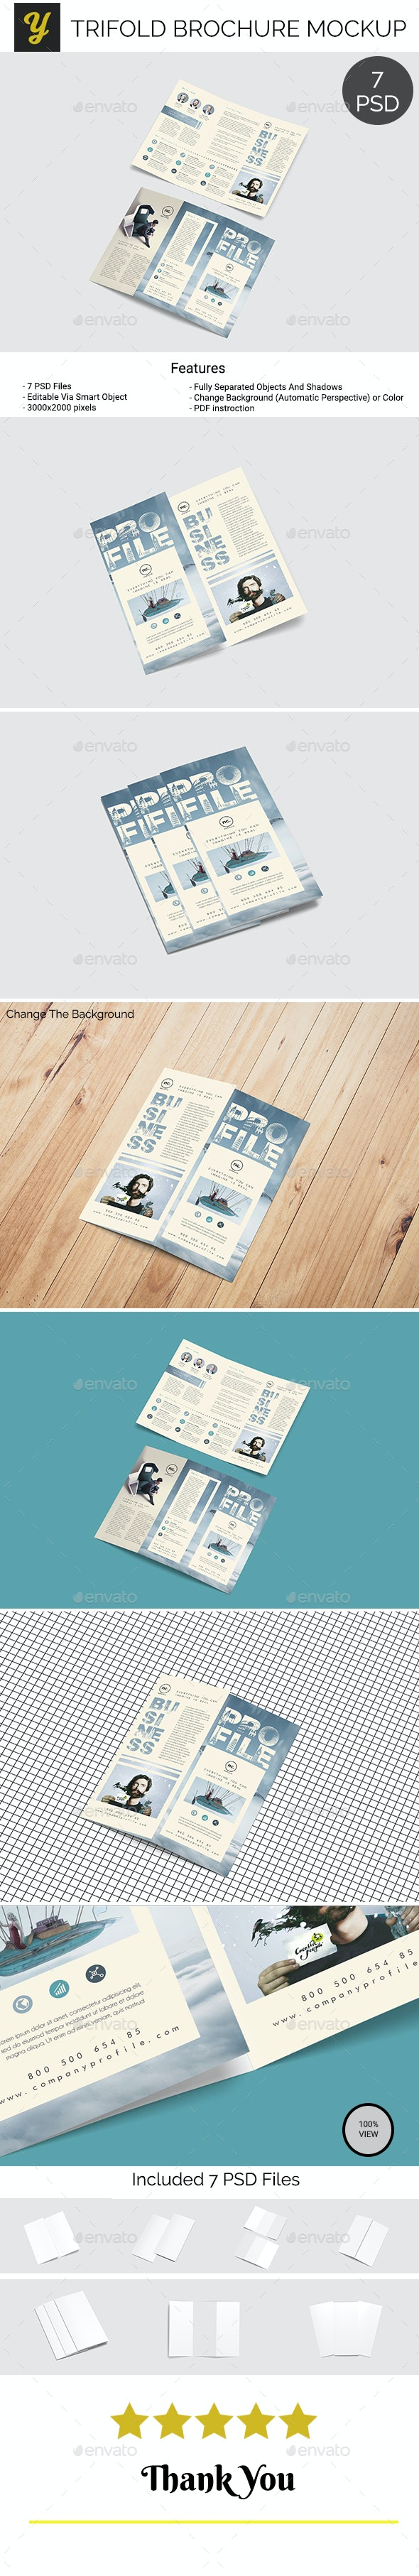 Trifold Brochure Mockup Vol.2 - Brochures Print